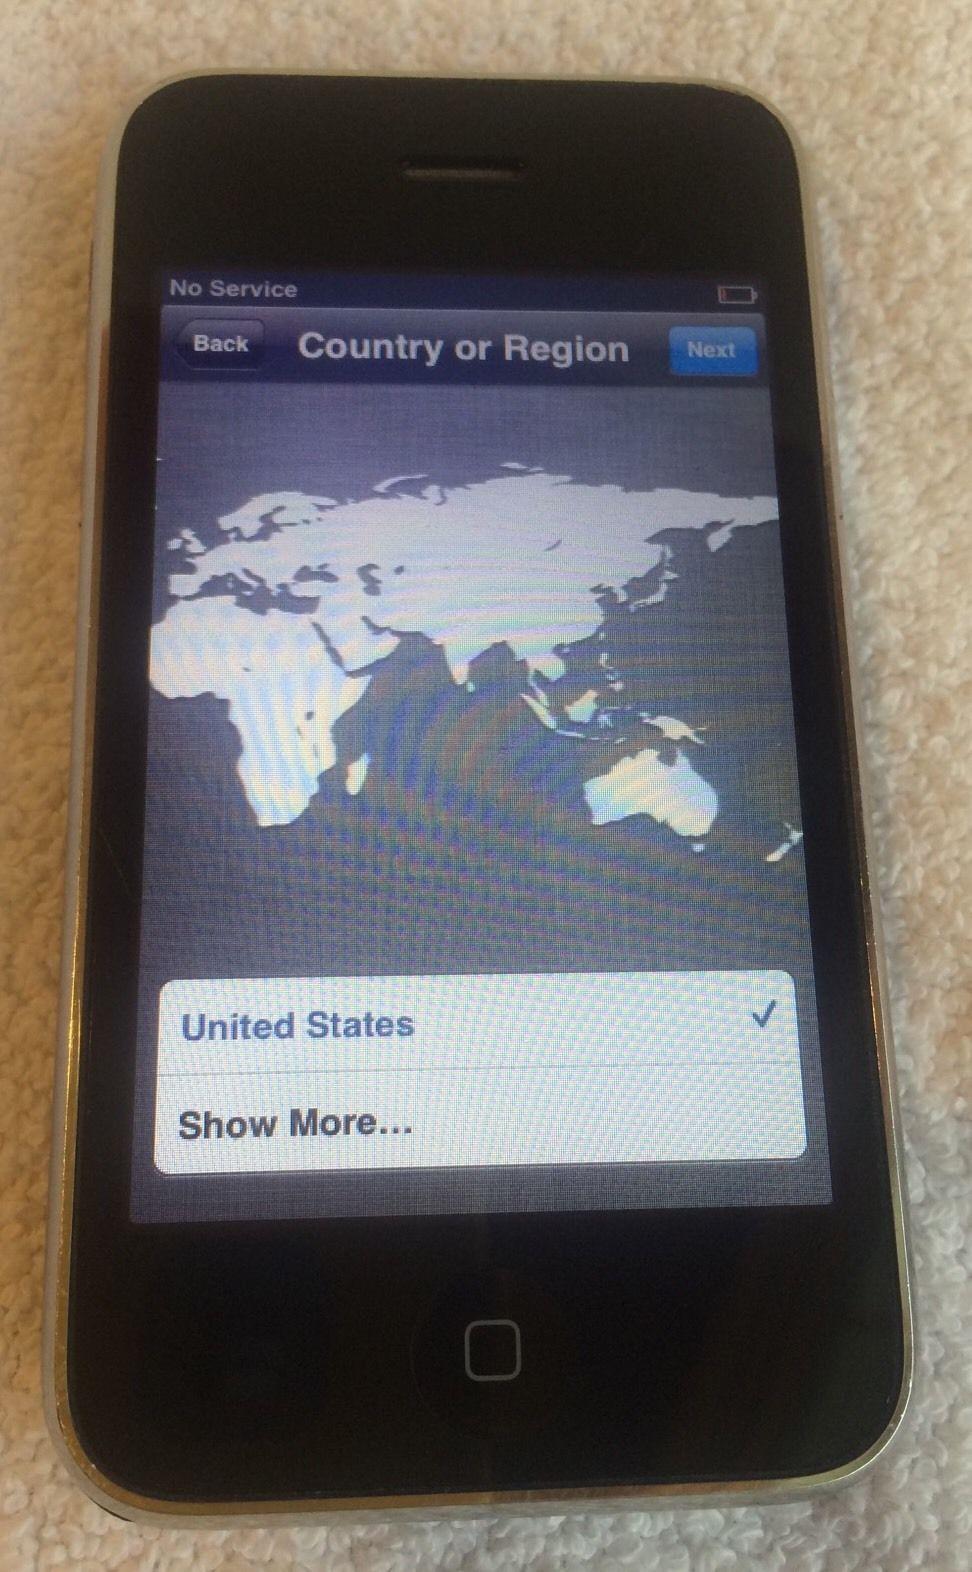 Apple iphone 3g 8gb black a1303 att cracked back